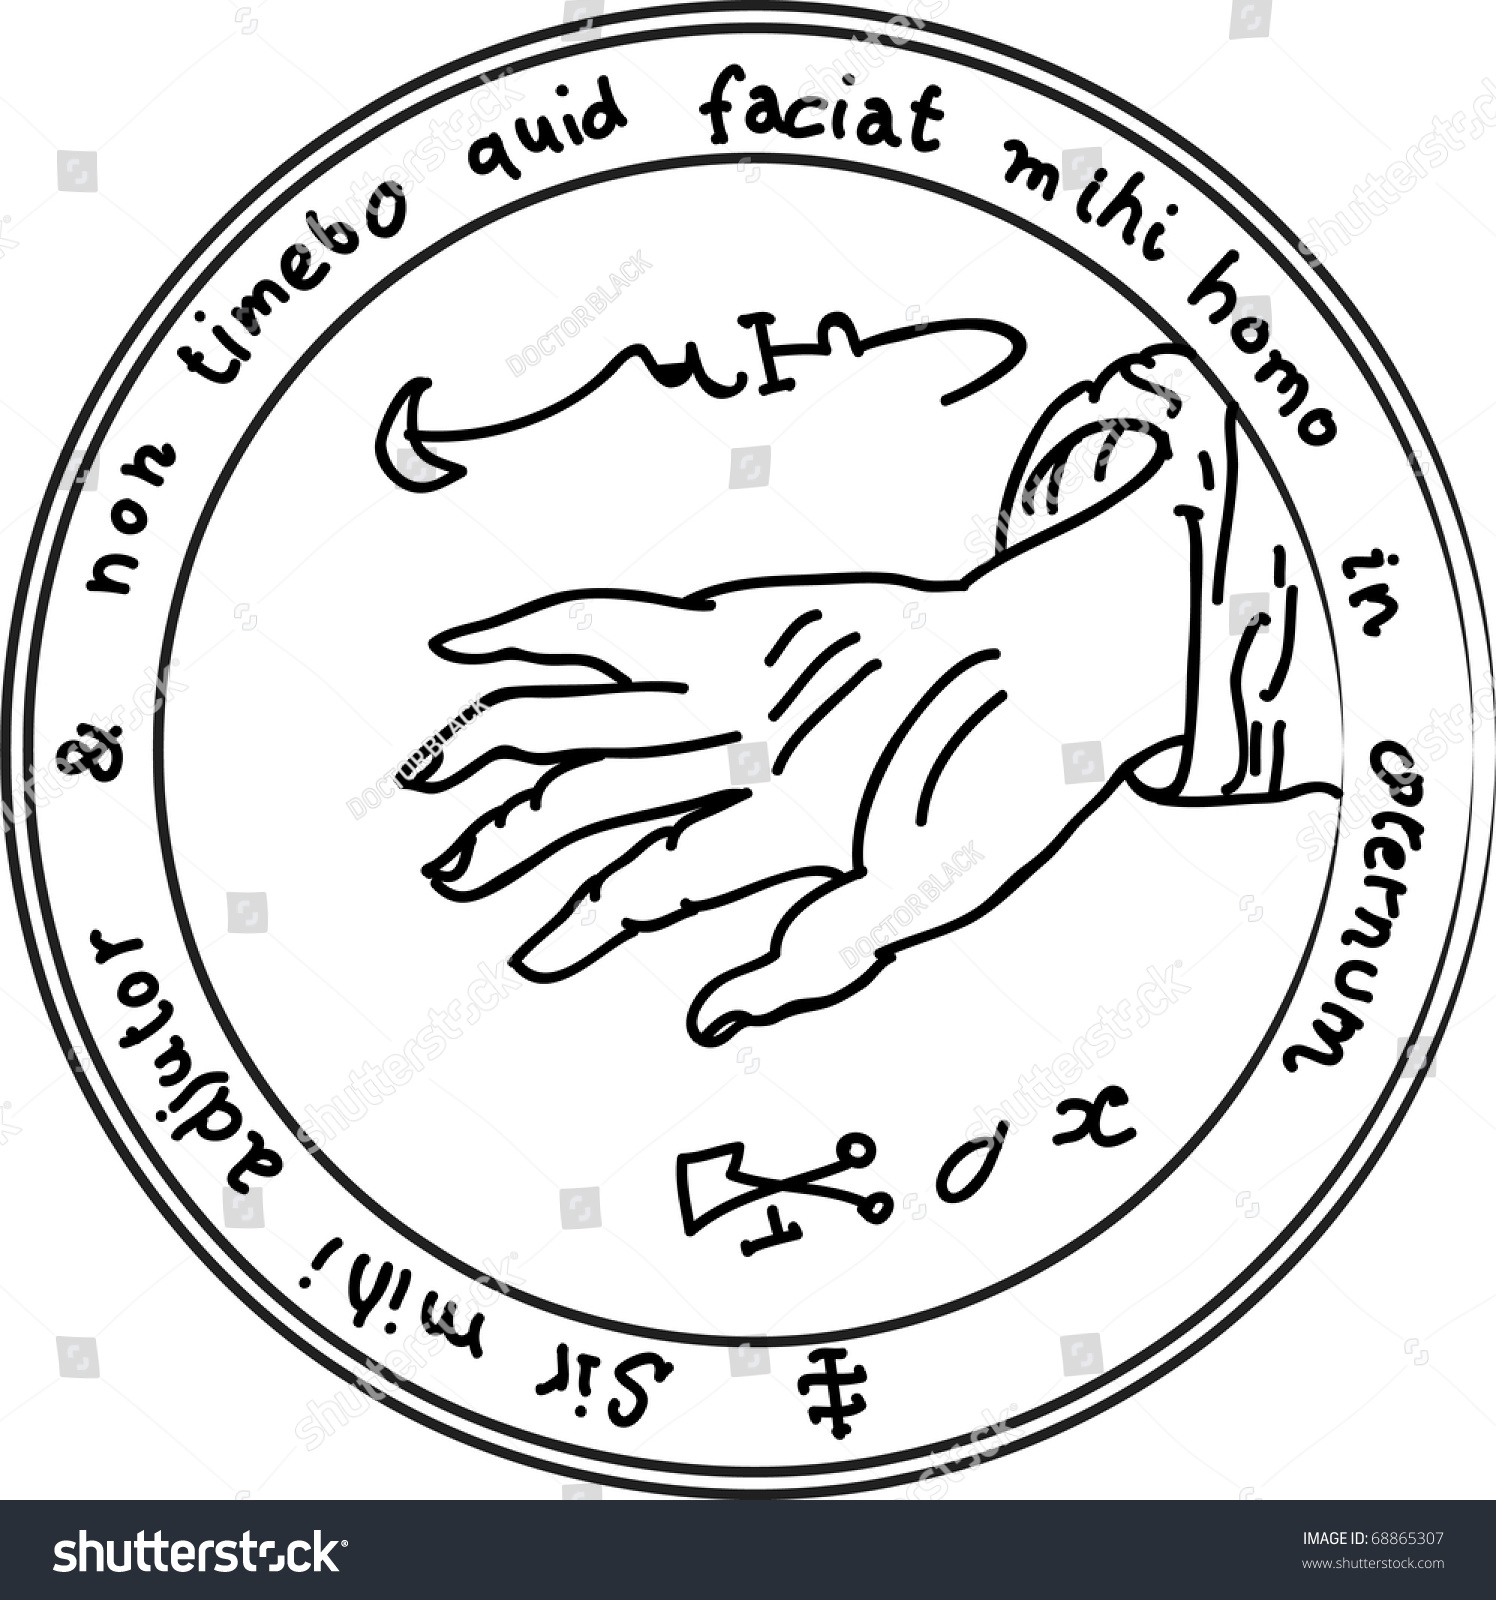 Occult ancient magic symbol vector element stock vector 68865307 occult ancient magic symbol a vector element biocorpaavc Images